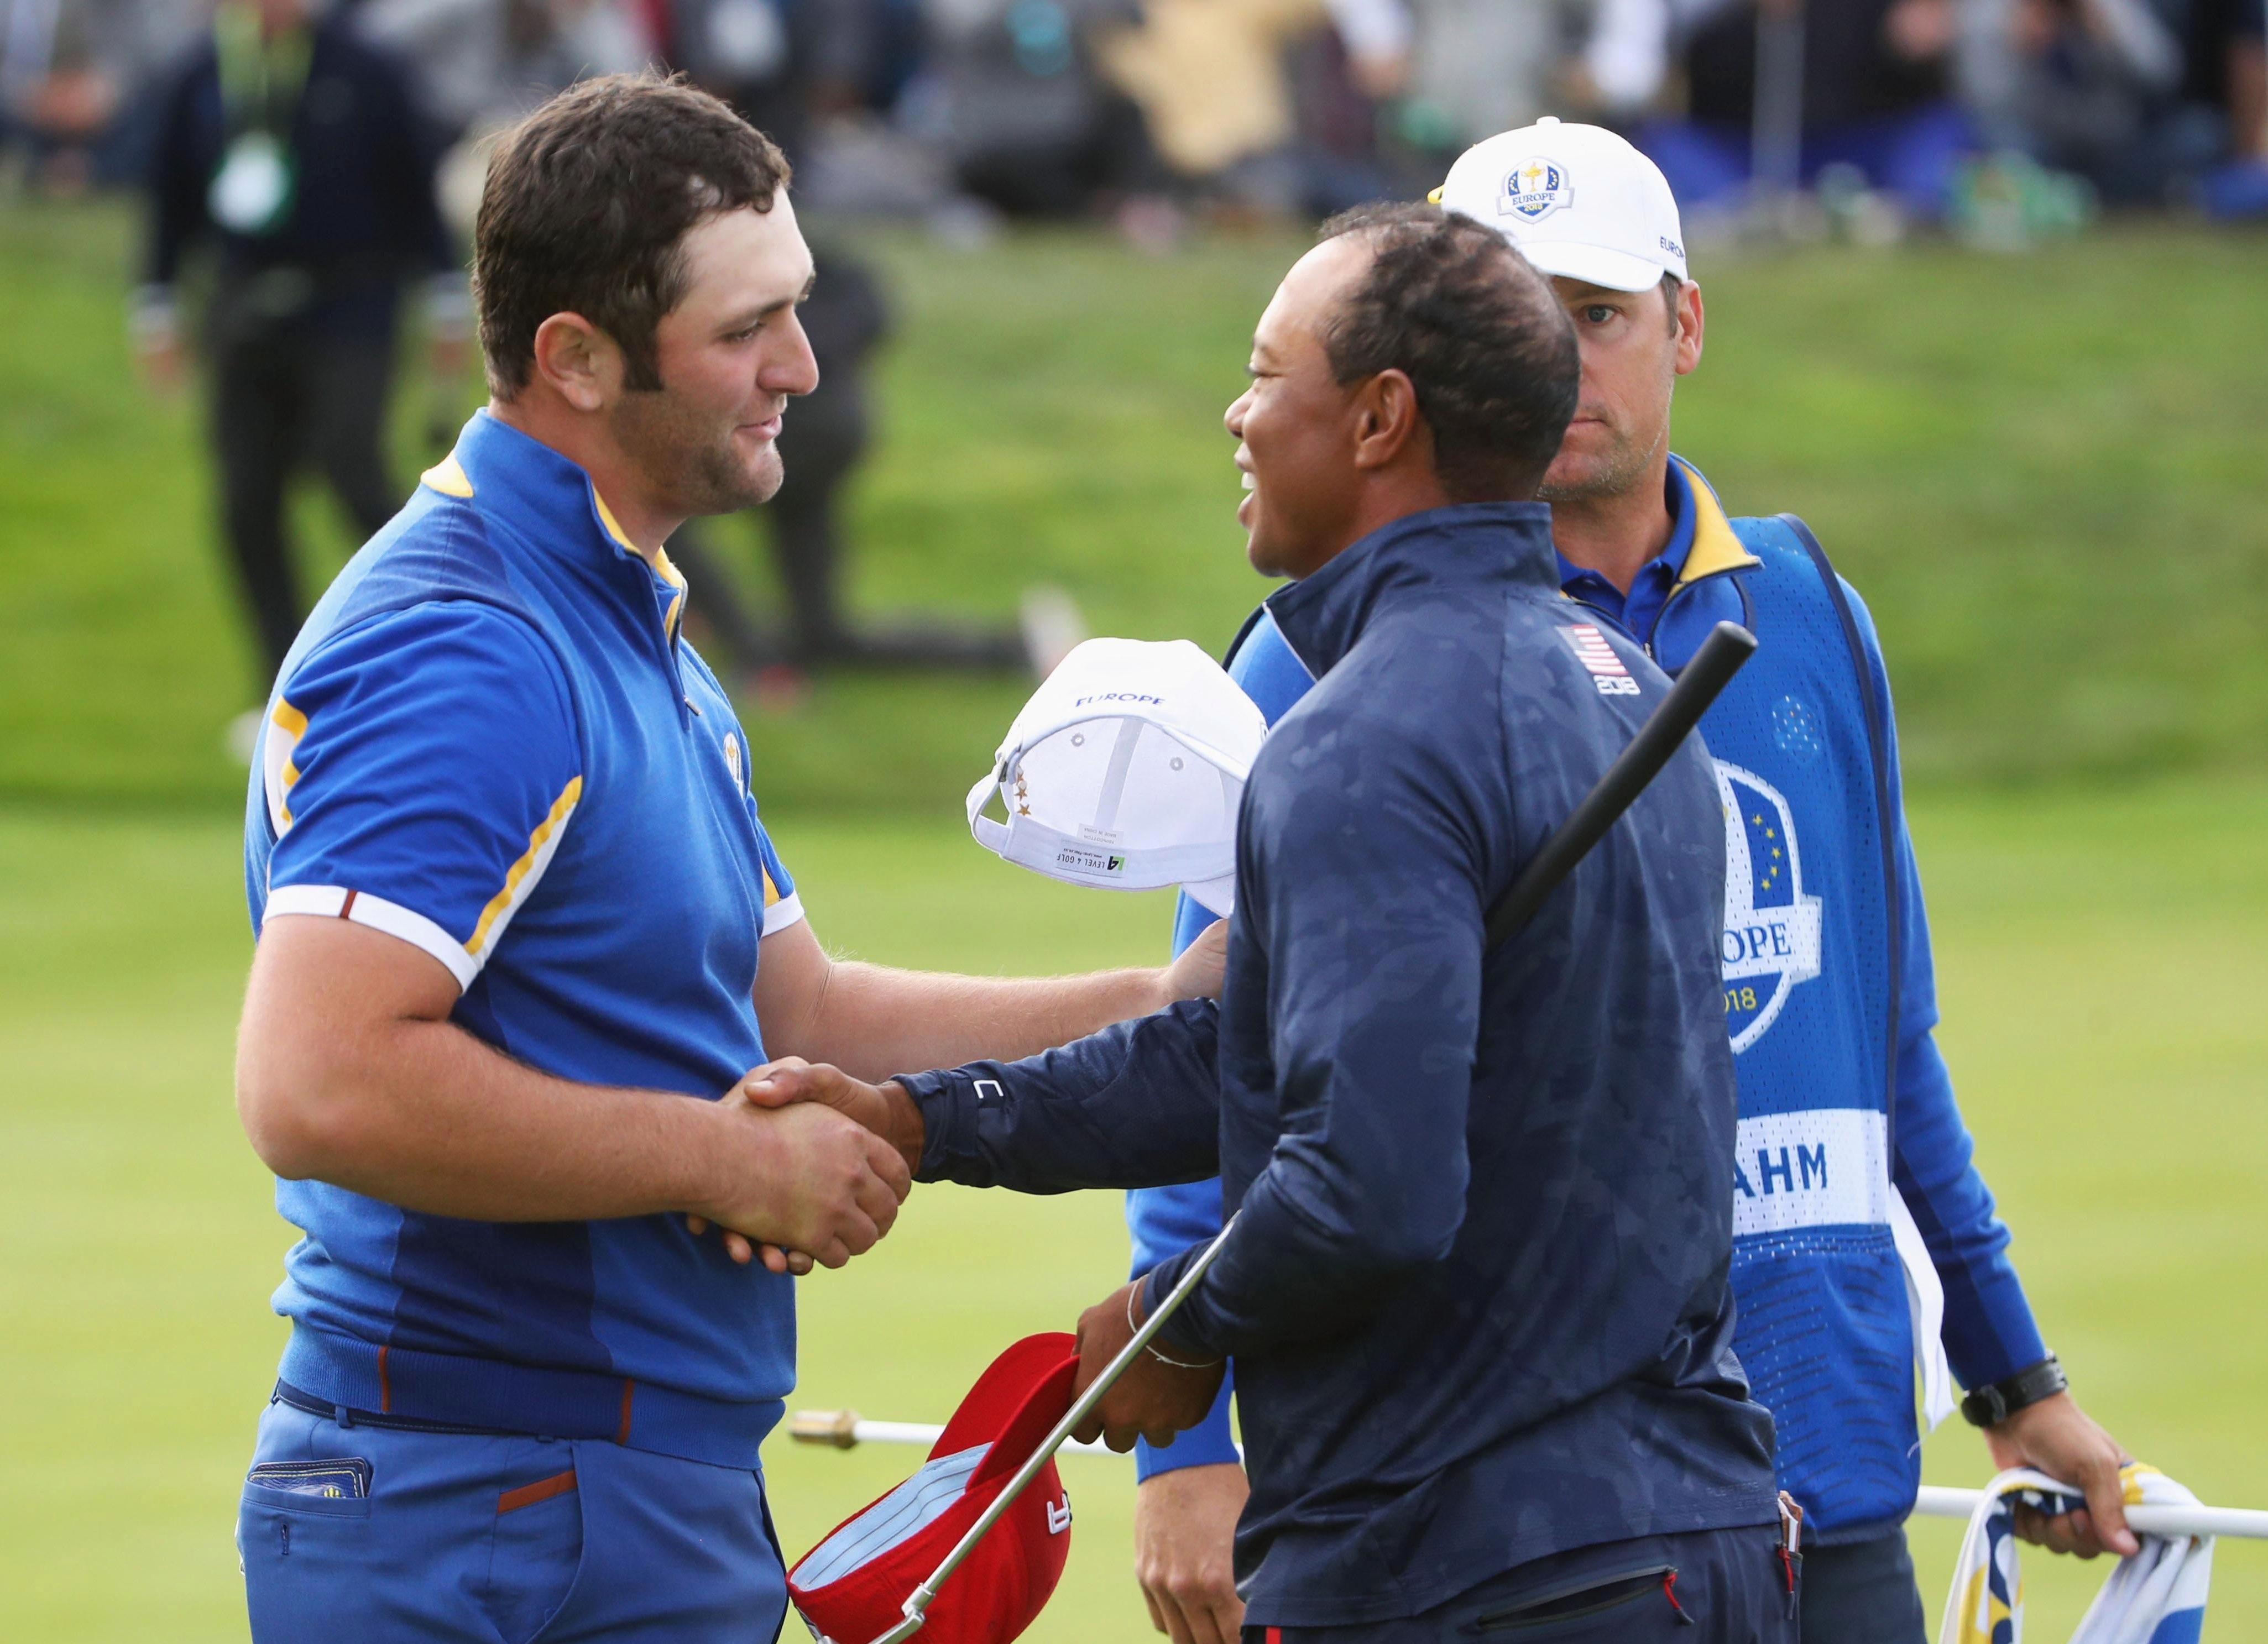 Jon Rahm was sensational as he beat Tiger Woods